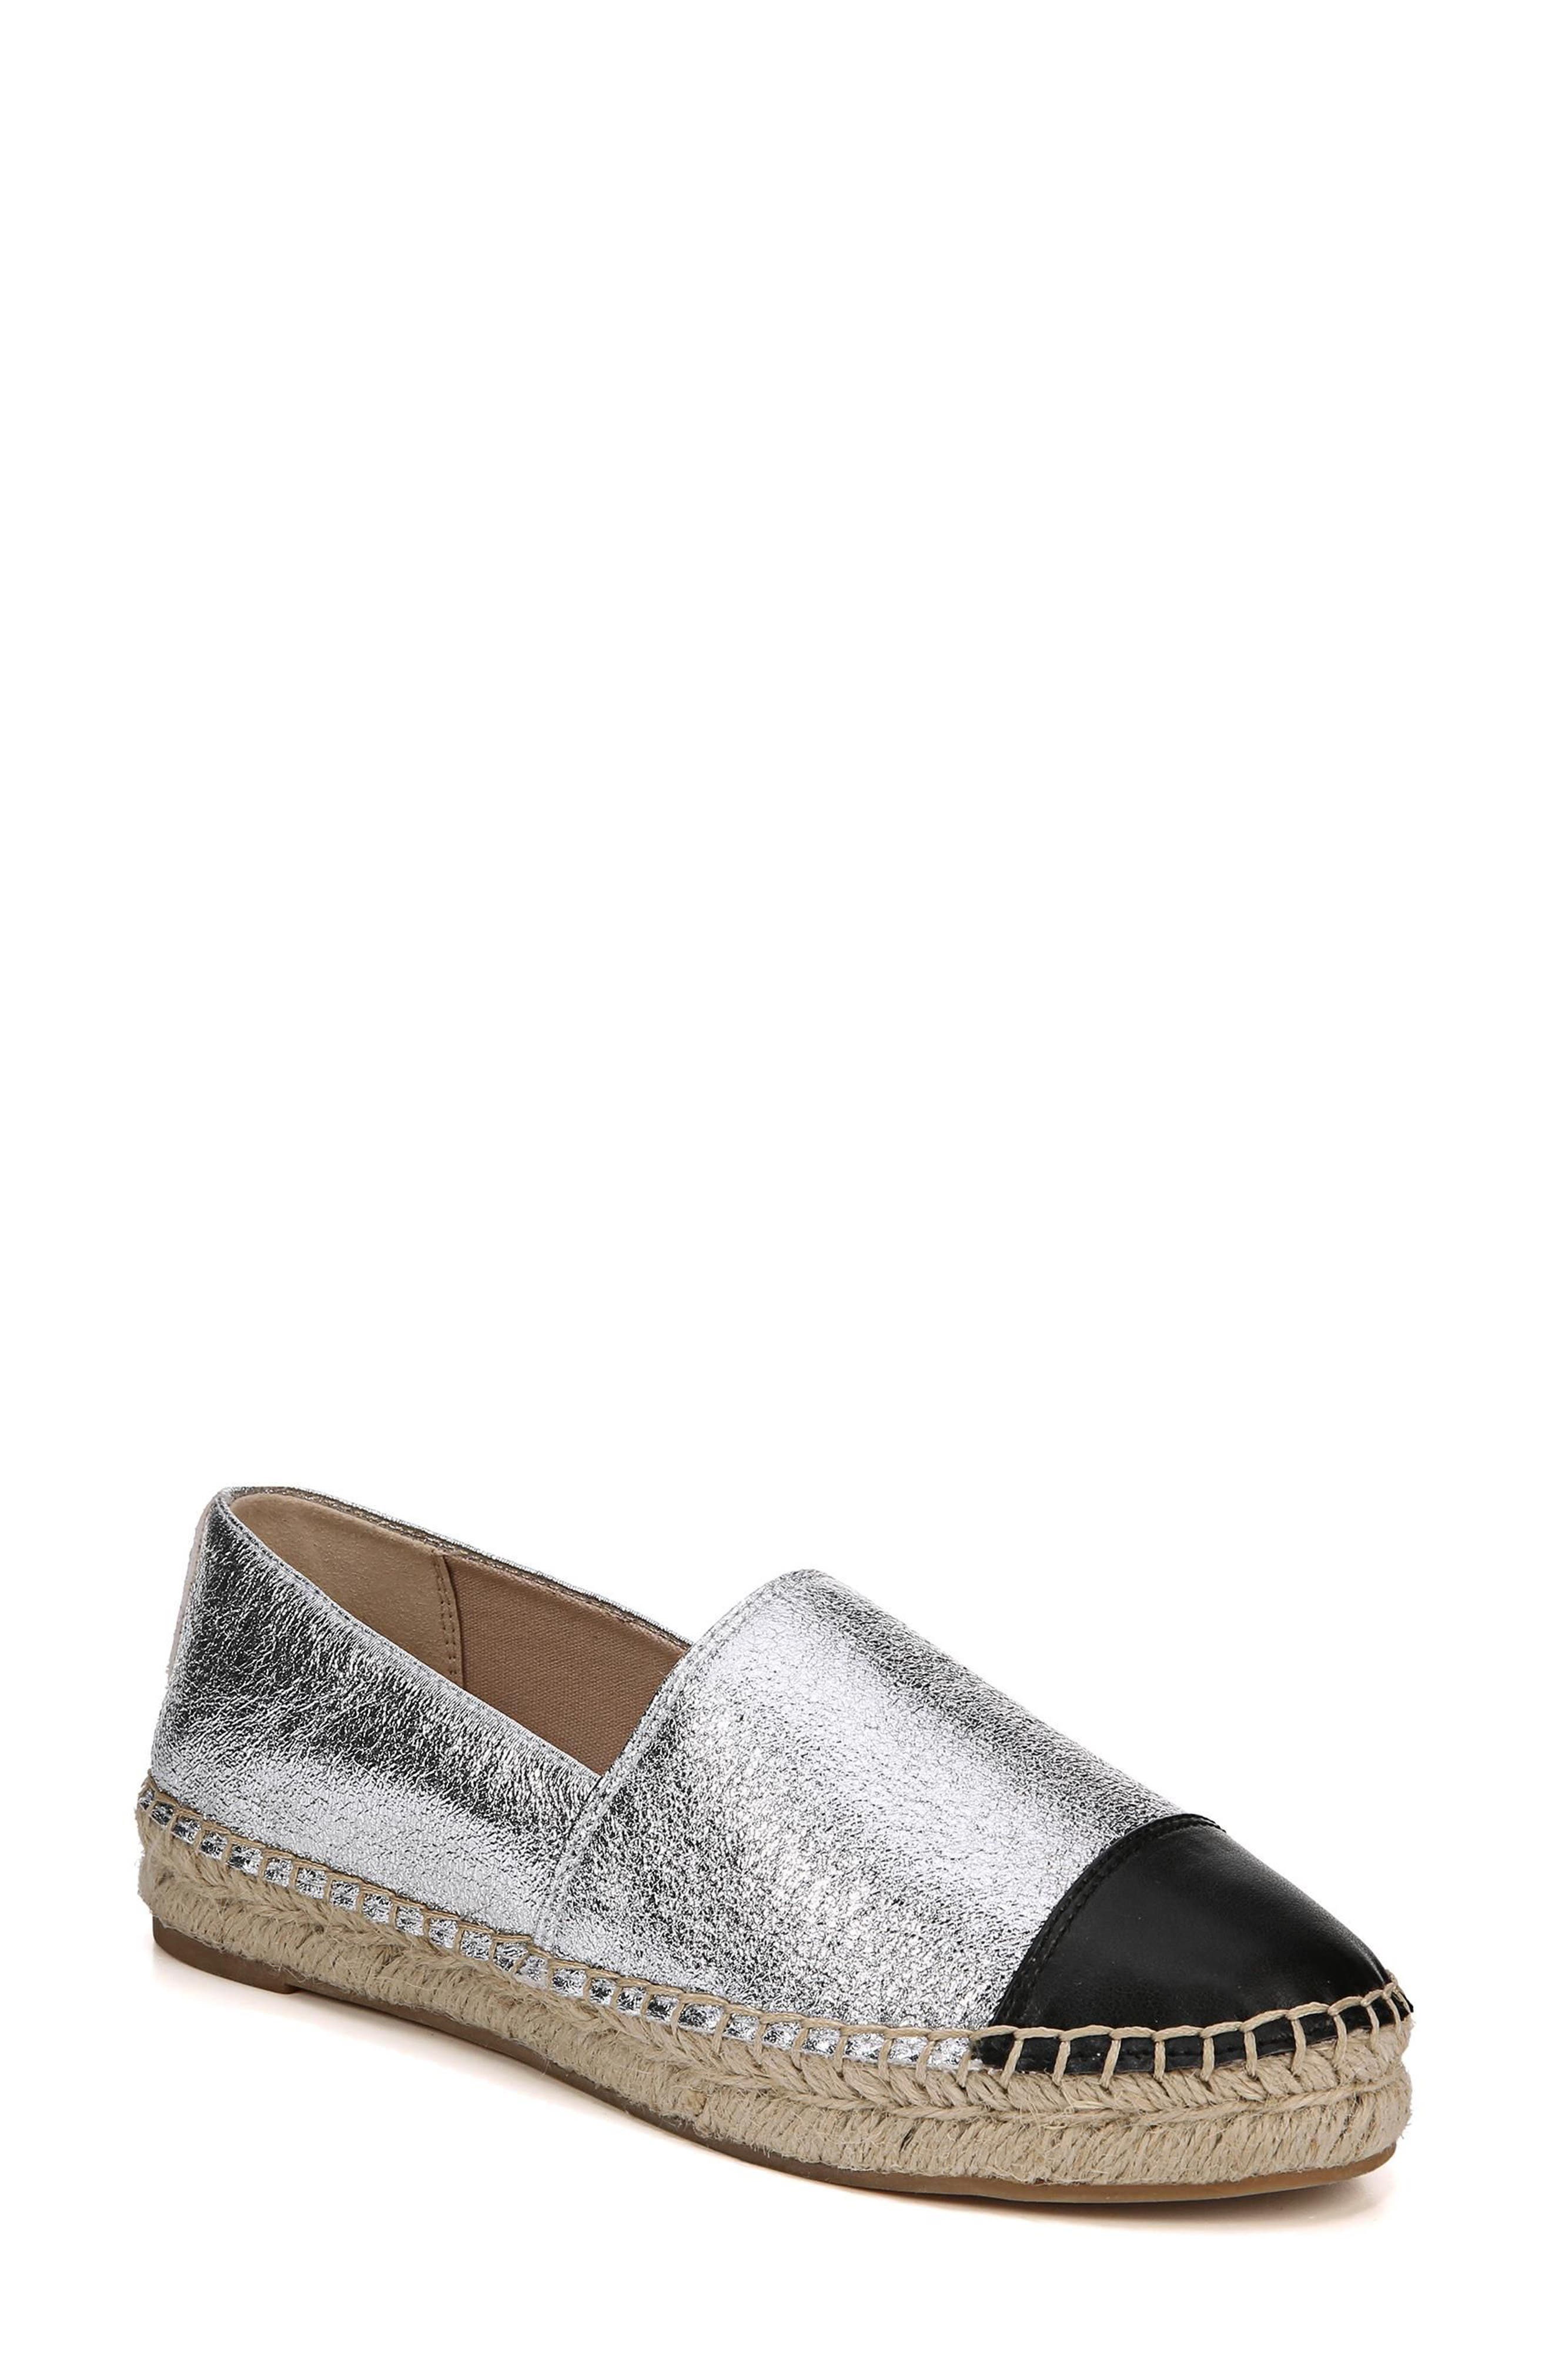 Sam Edelman Women's Felicia Soft Silver/Luna Metallic Lea W iMbmJ